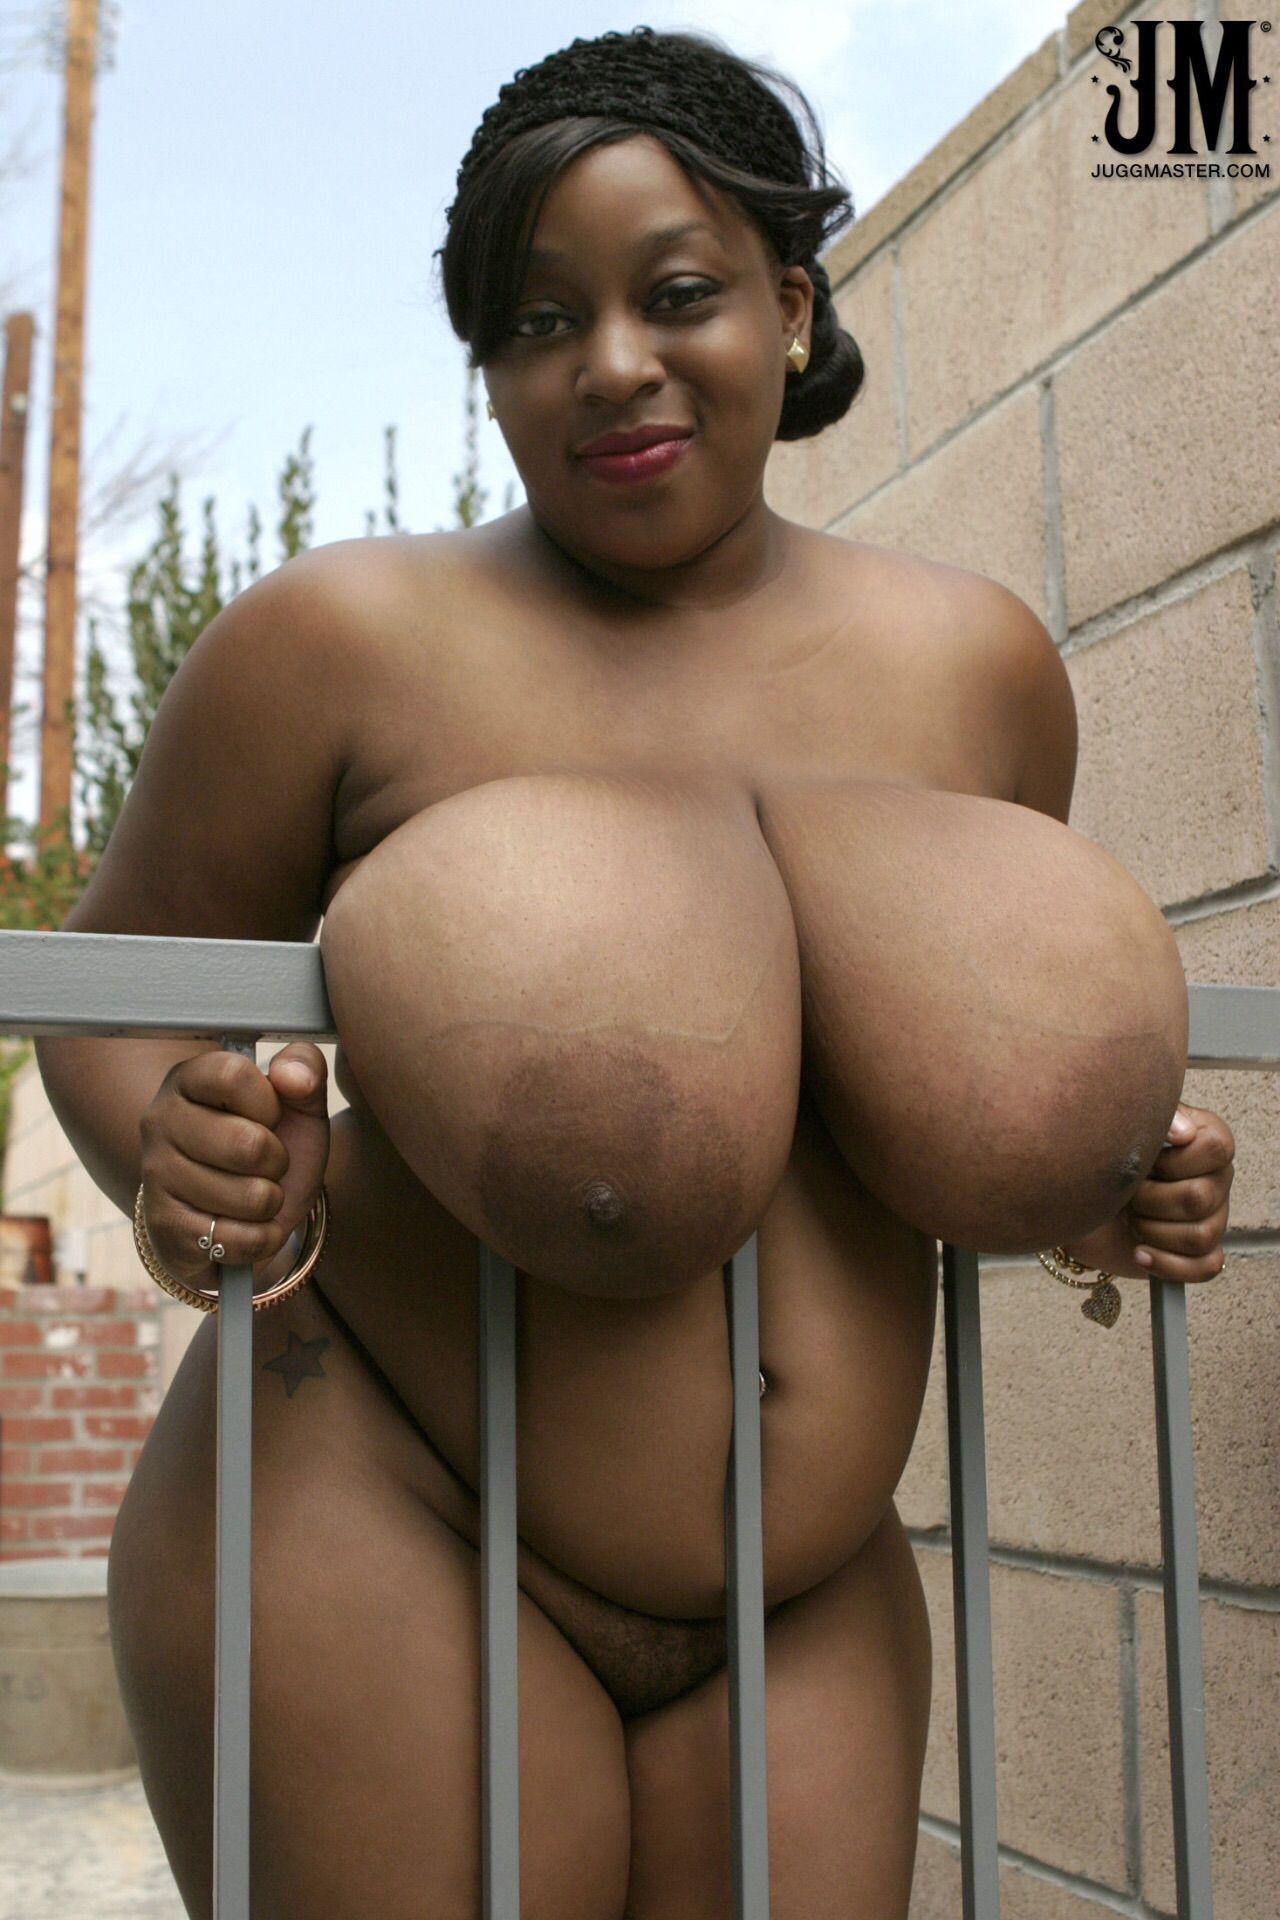 Curvy blonde girl naked